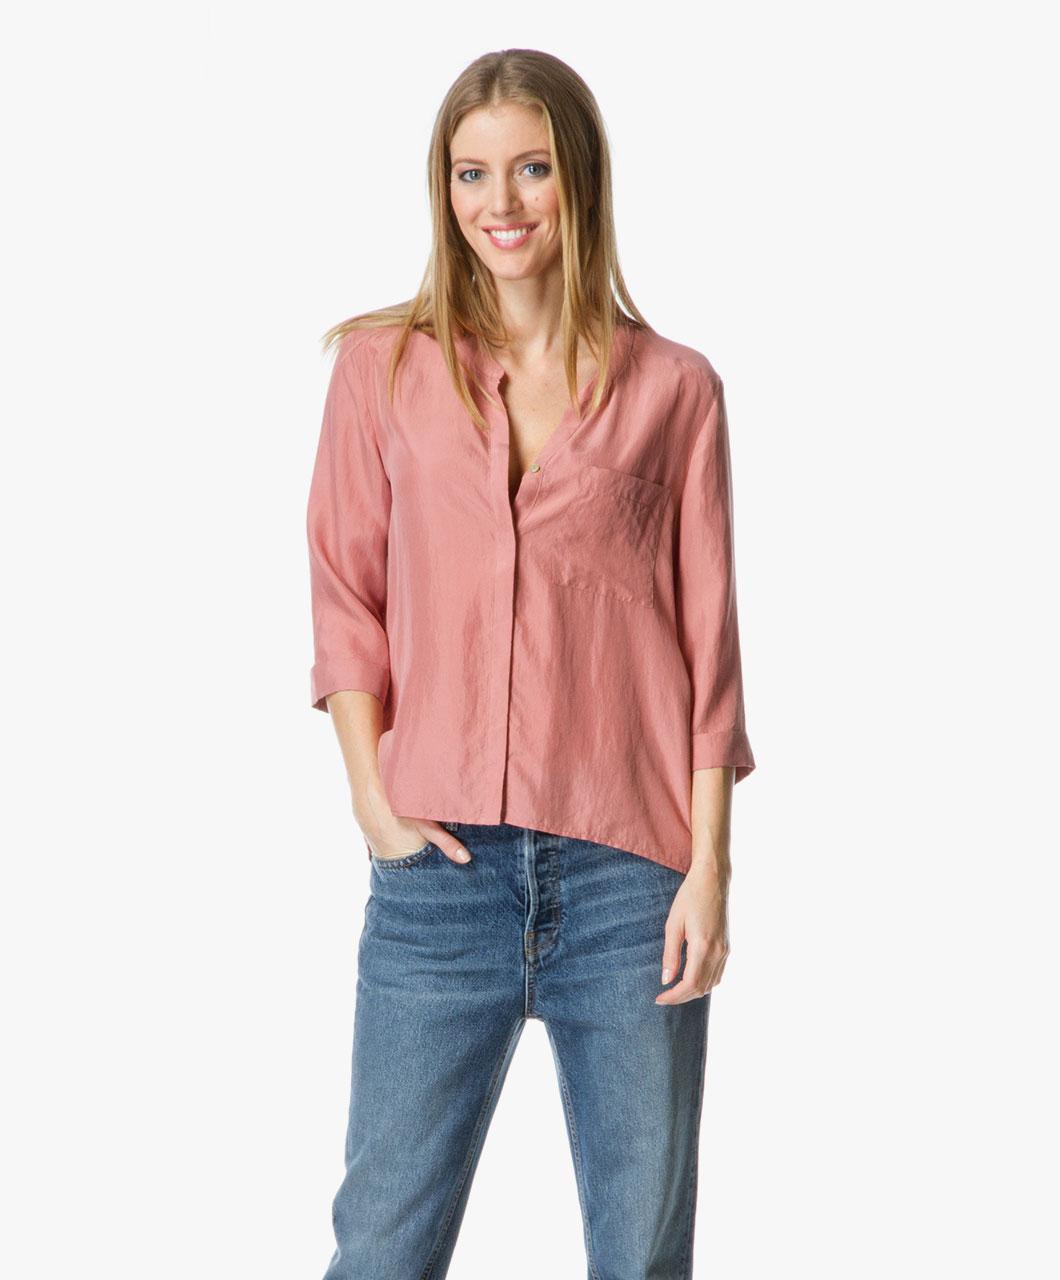 boss orange evena silk blouse medium pink evena 50302118 665 medium pink. Black Bedroom Furniture Sets. Home Design Ideas